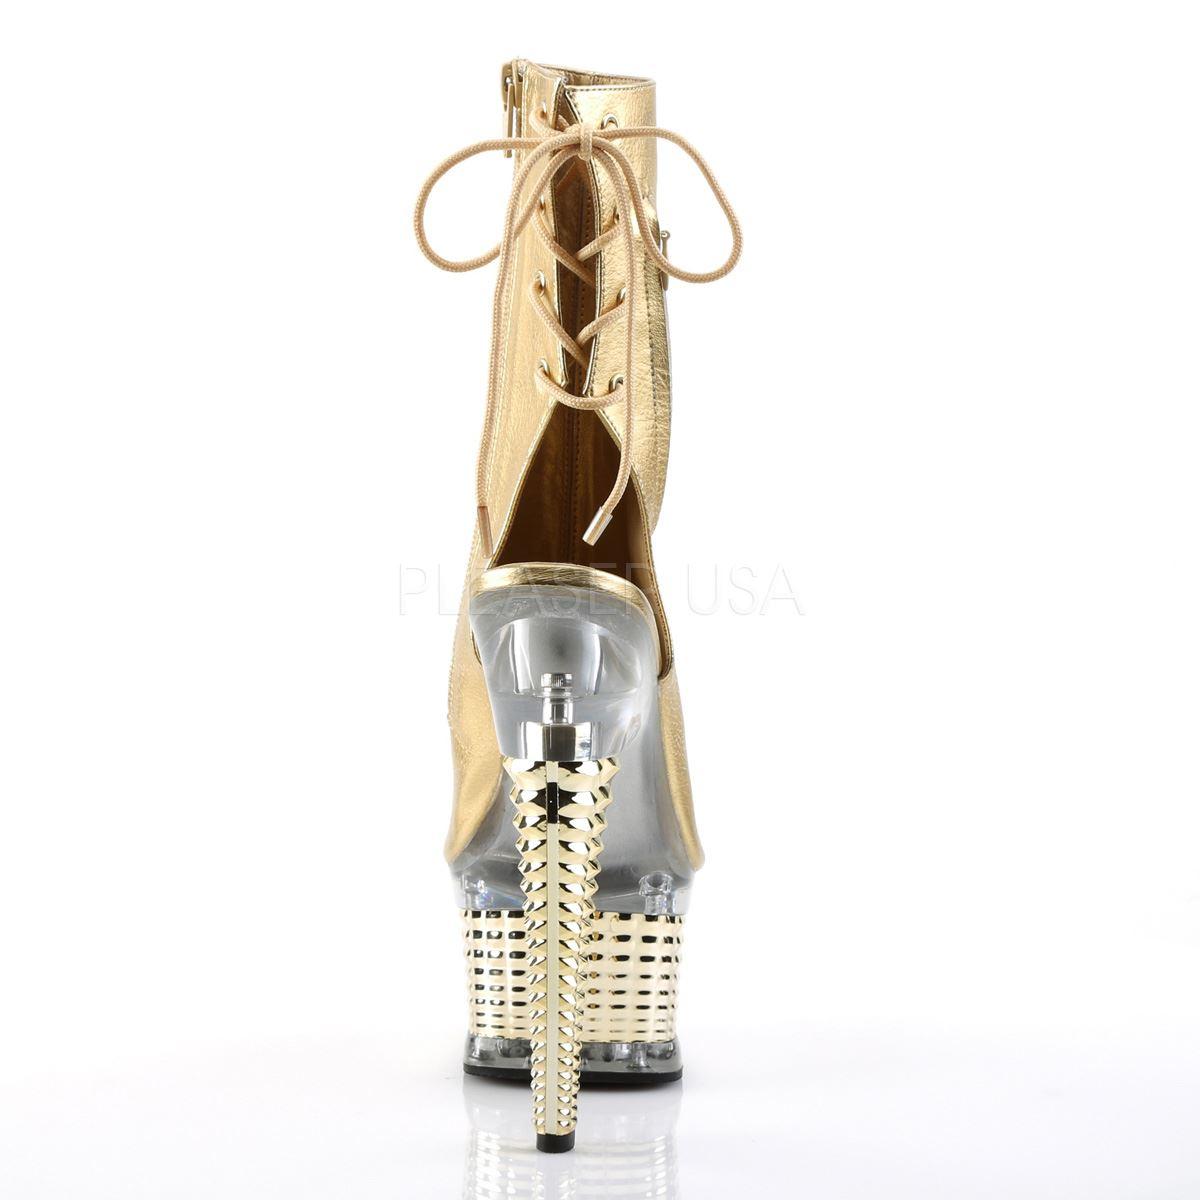 Pleaser Platform Open Toe And Heel Metallic Ankle Boot Gold Metallic Heel Pu/Gold Chrome 026138